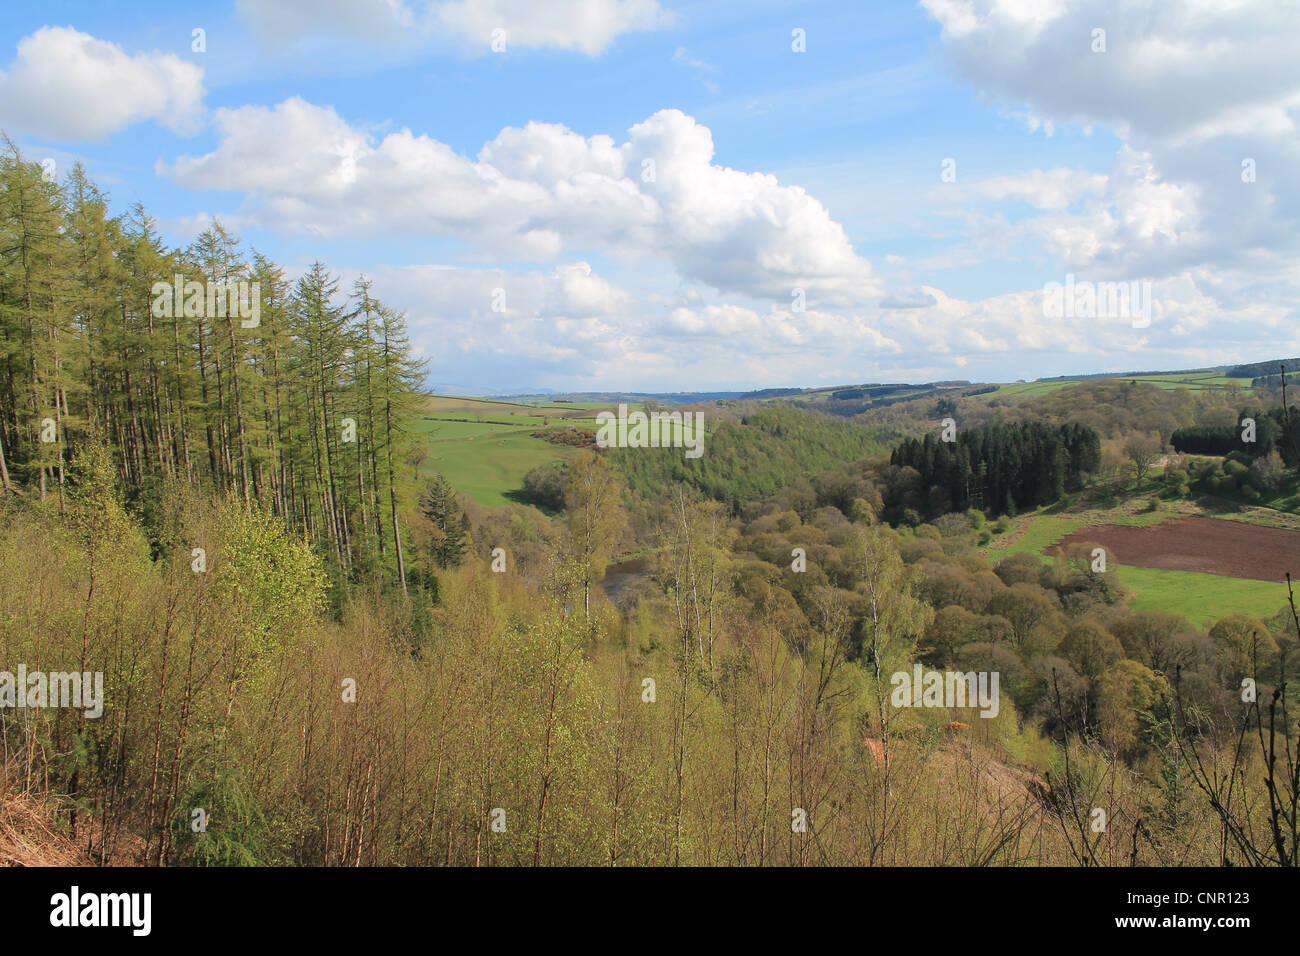 The Eden Valley in Cumbria, England. - Stock Image